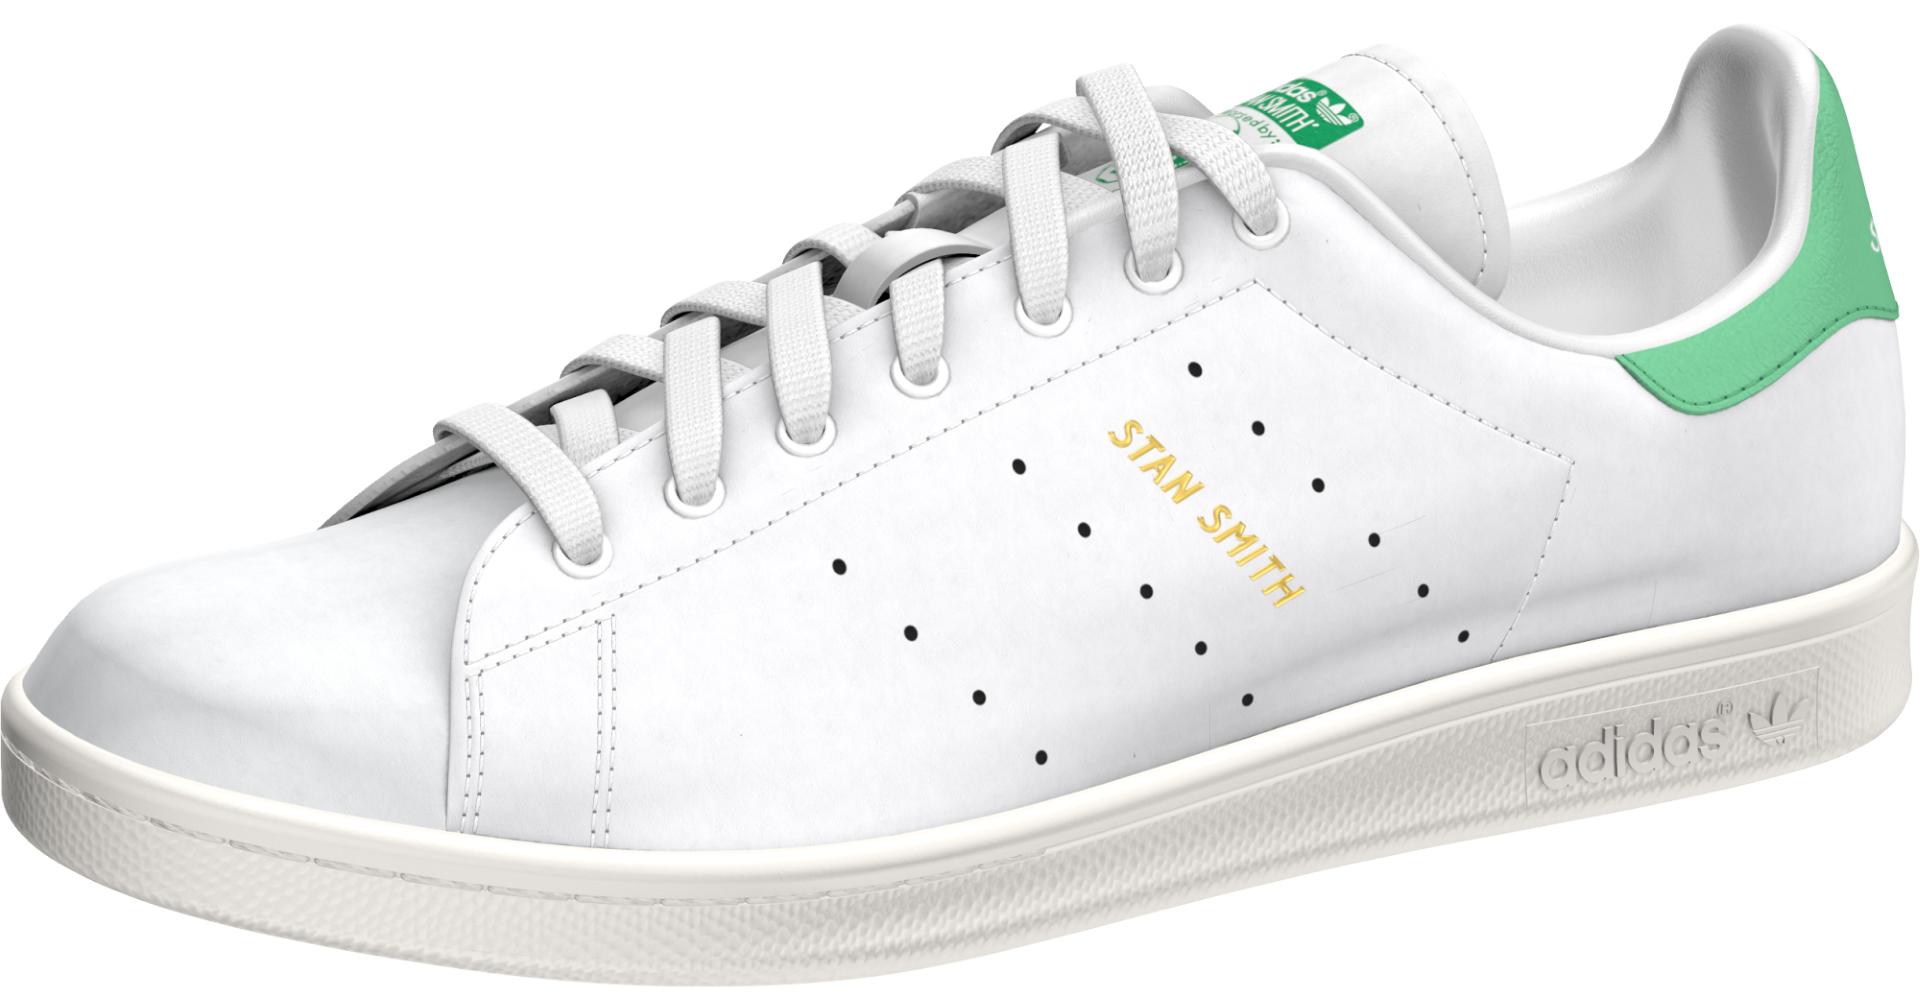 Adidas Stan Smith teniszcipő